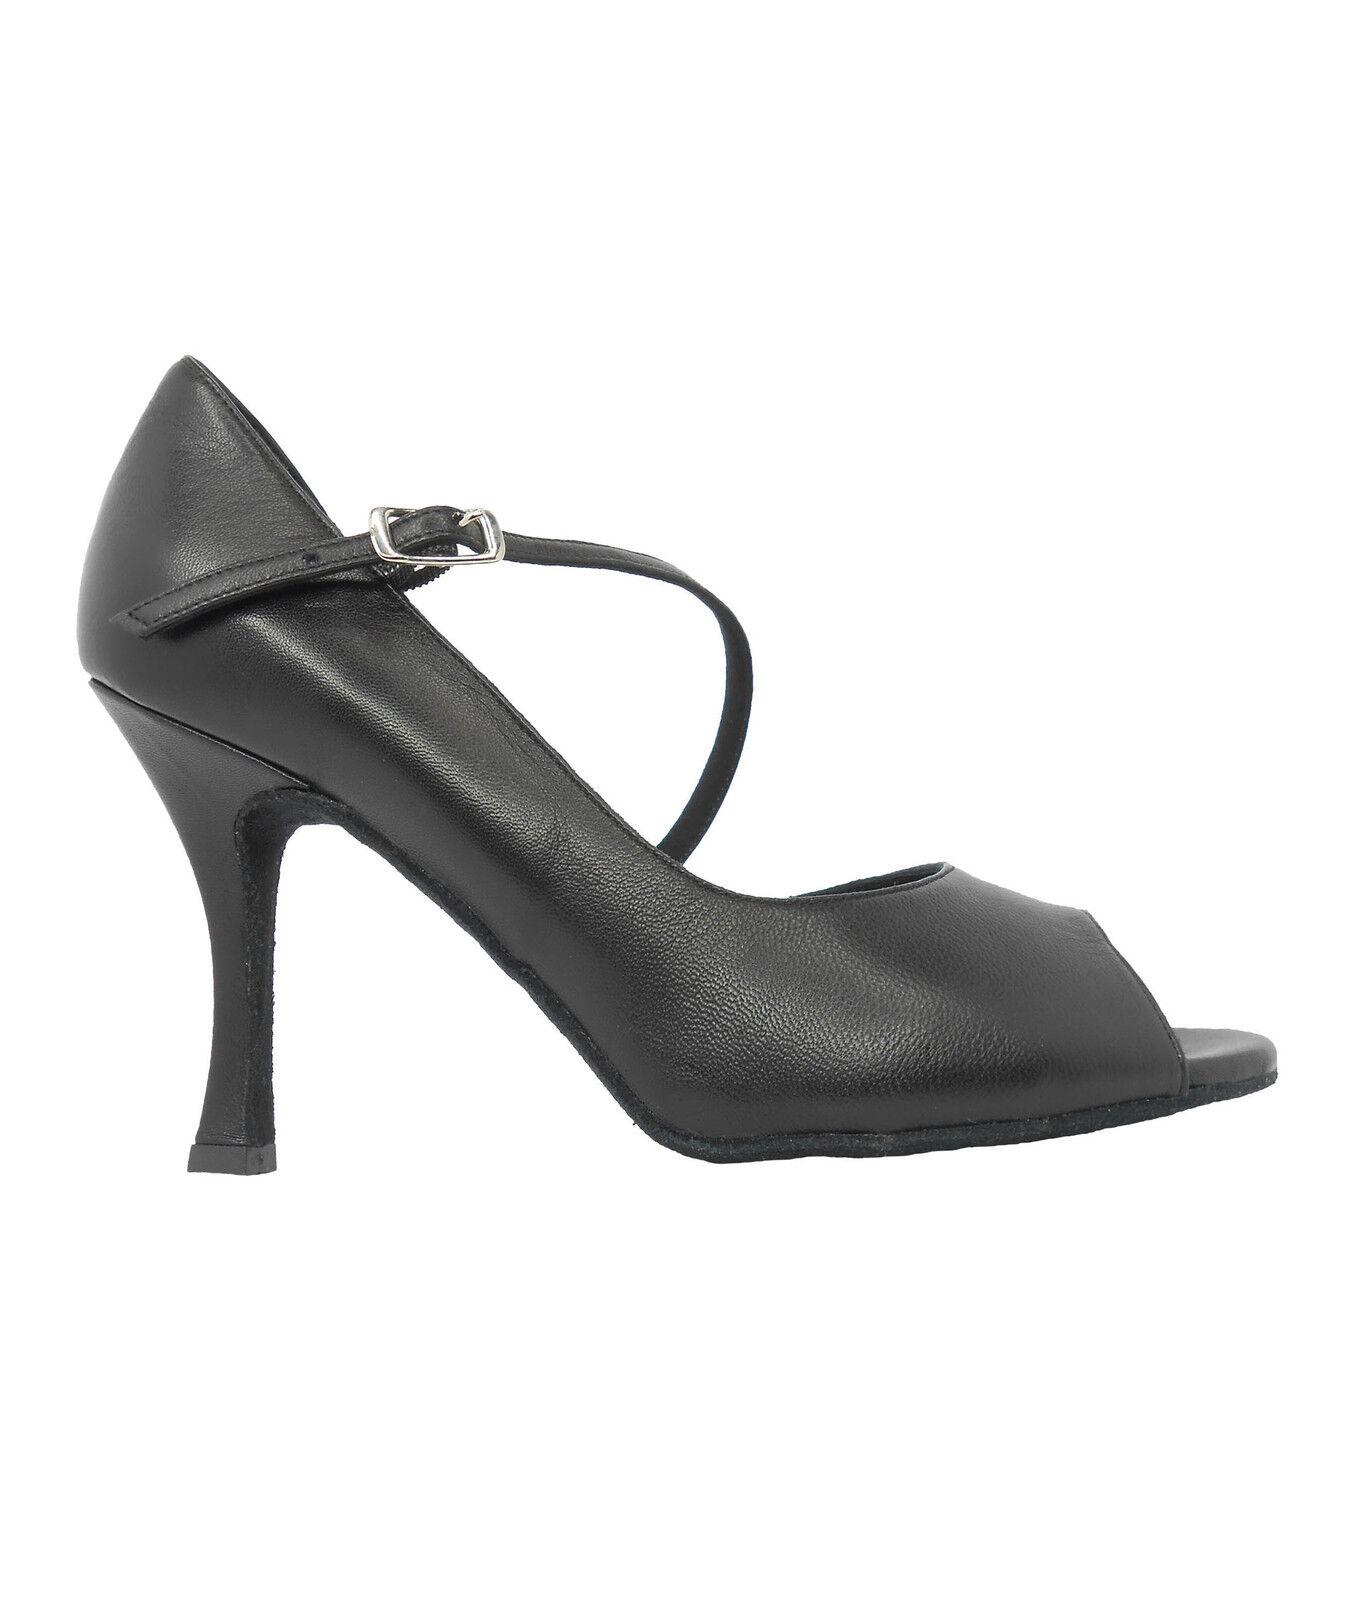 Ritmo VL424 Damen Tango Latein Salsa Rumba Standard Schuhe schwarz Abs. 9 cm